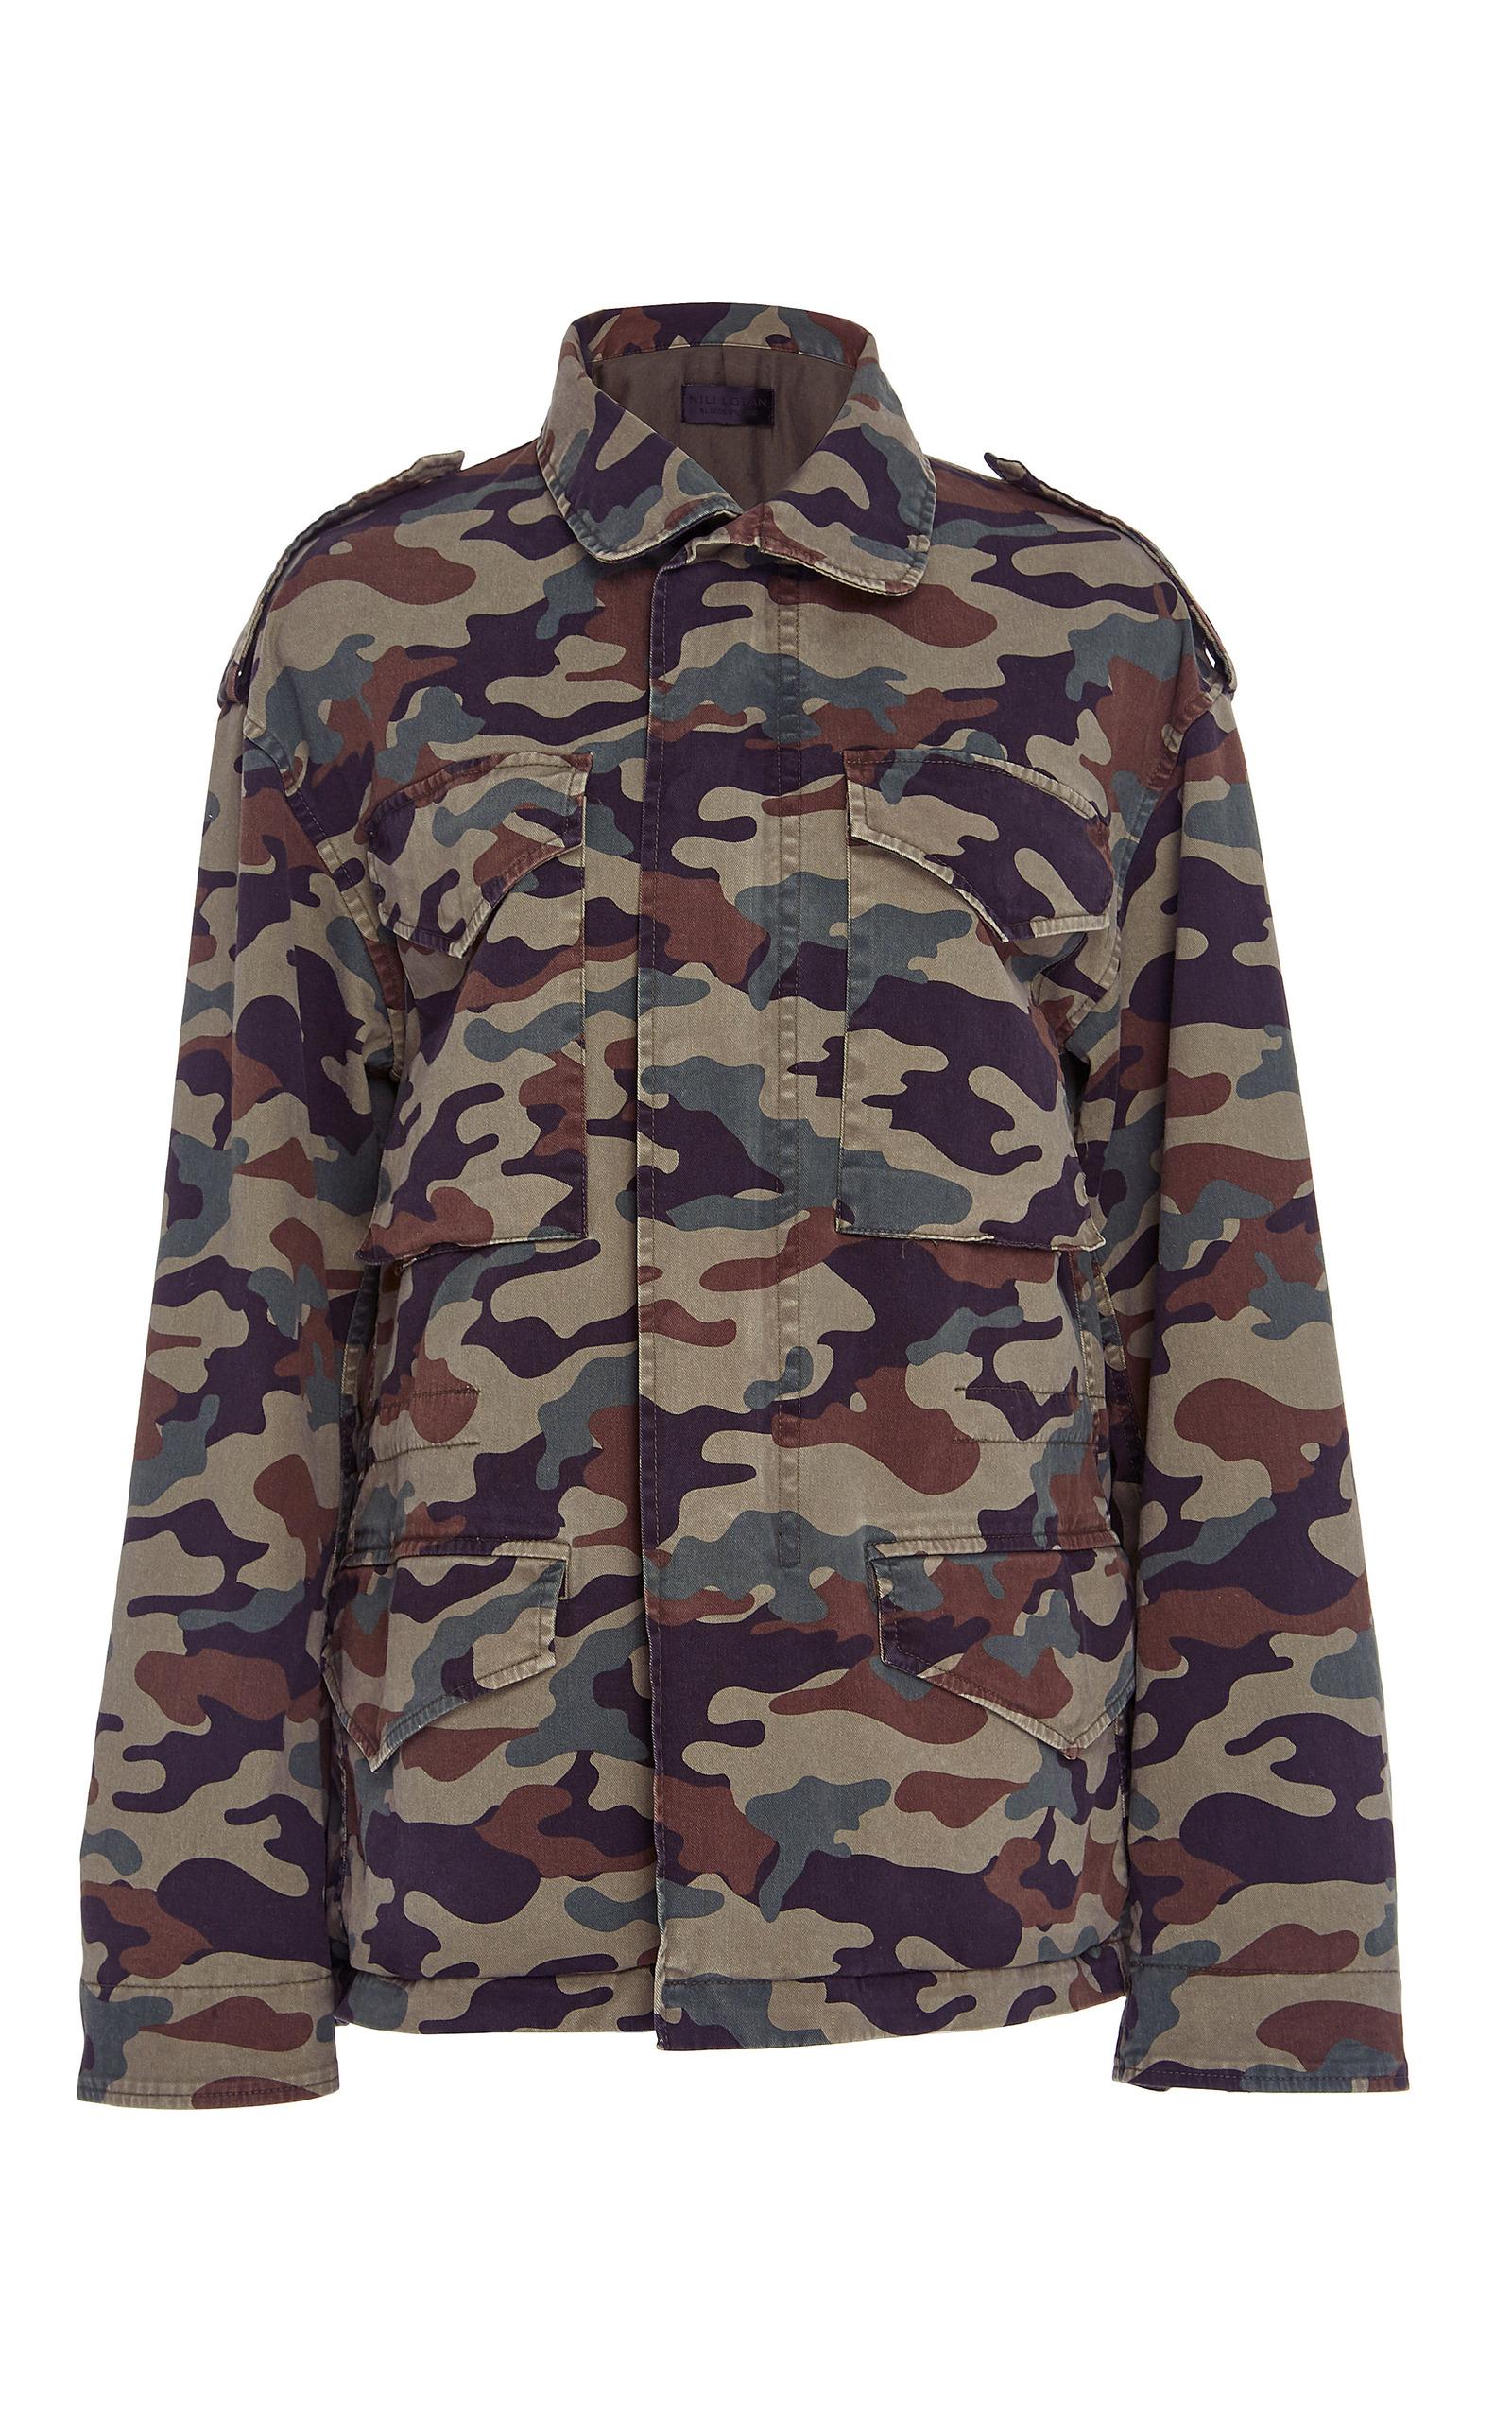 5bcb9e3ca6464 Ashton Camo Jacket by NILI LOTAN | Moda Operandi